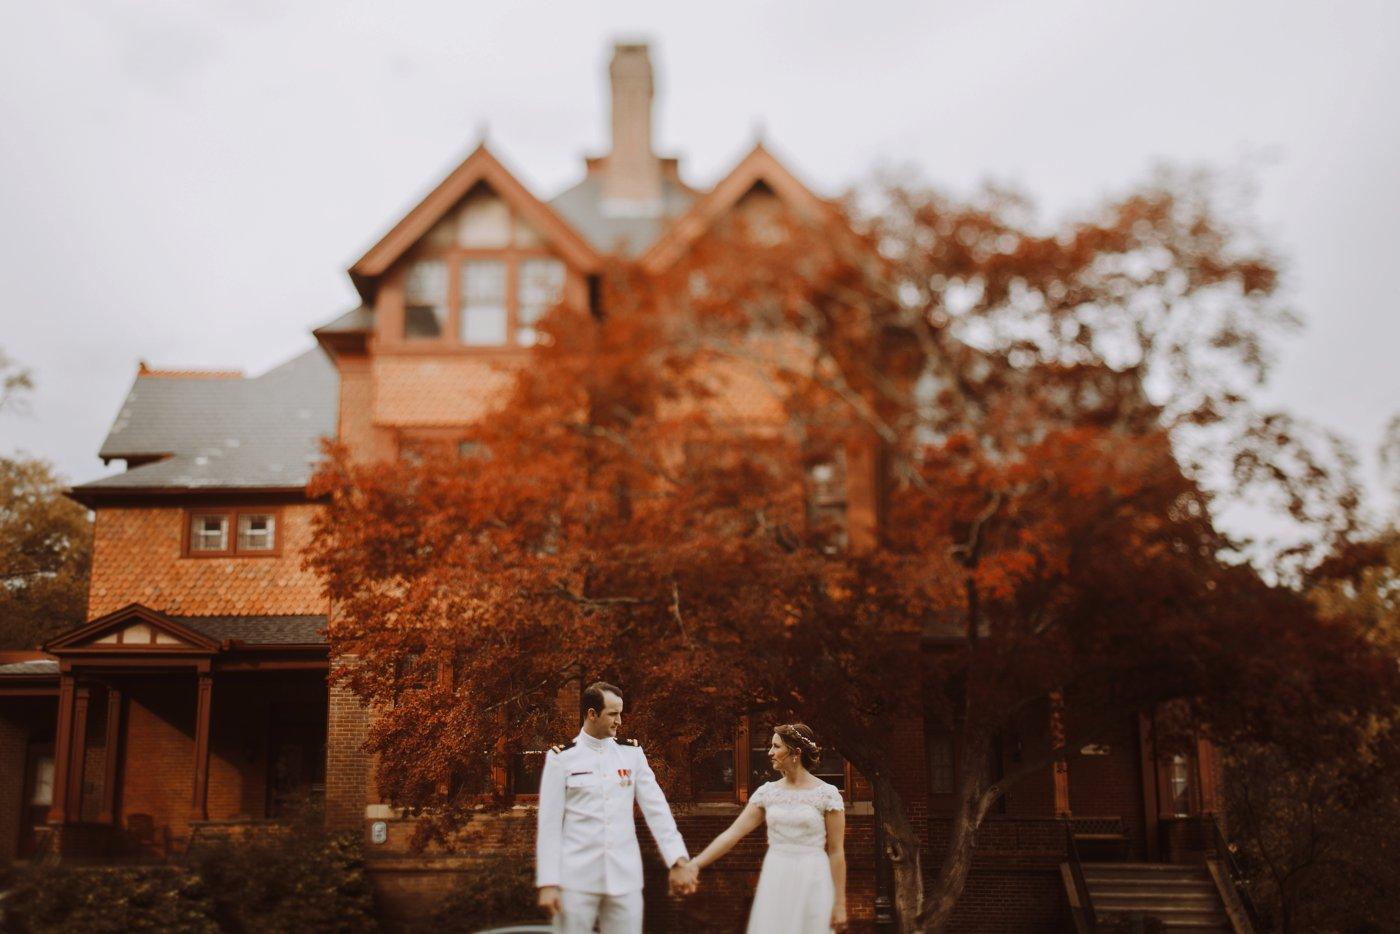 USNA Downtown Annapolis Maryland wedding Annapolis wedding photographer